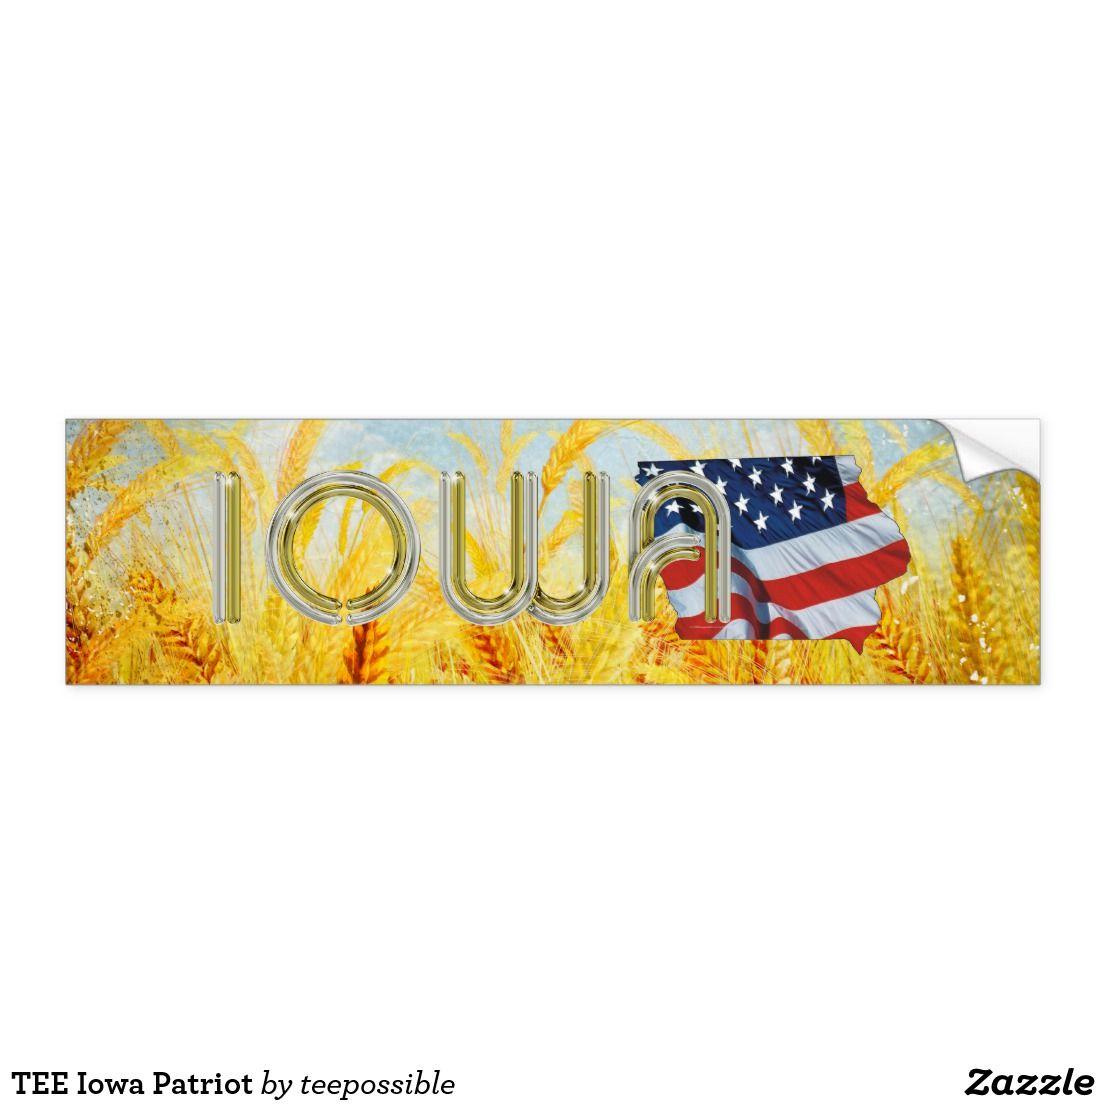 Tee Iowa Patriot Bumper Sticker Zazzle Com Bumper Stickers Bumpers Strong Adhesive [ 1106 x 1106 Pixel ]